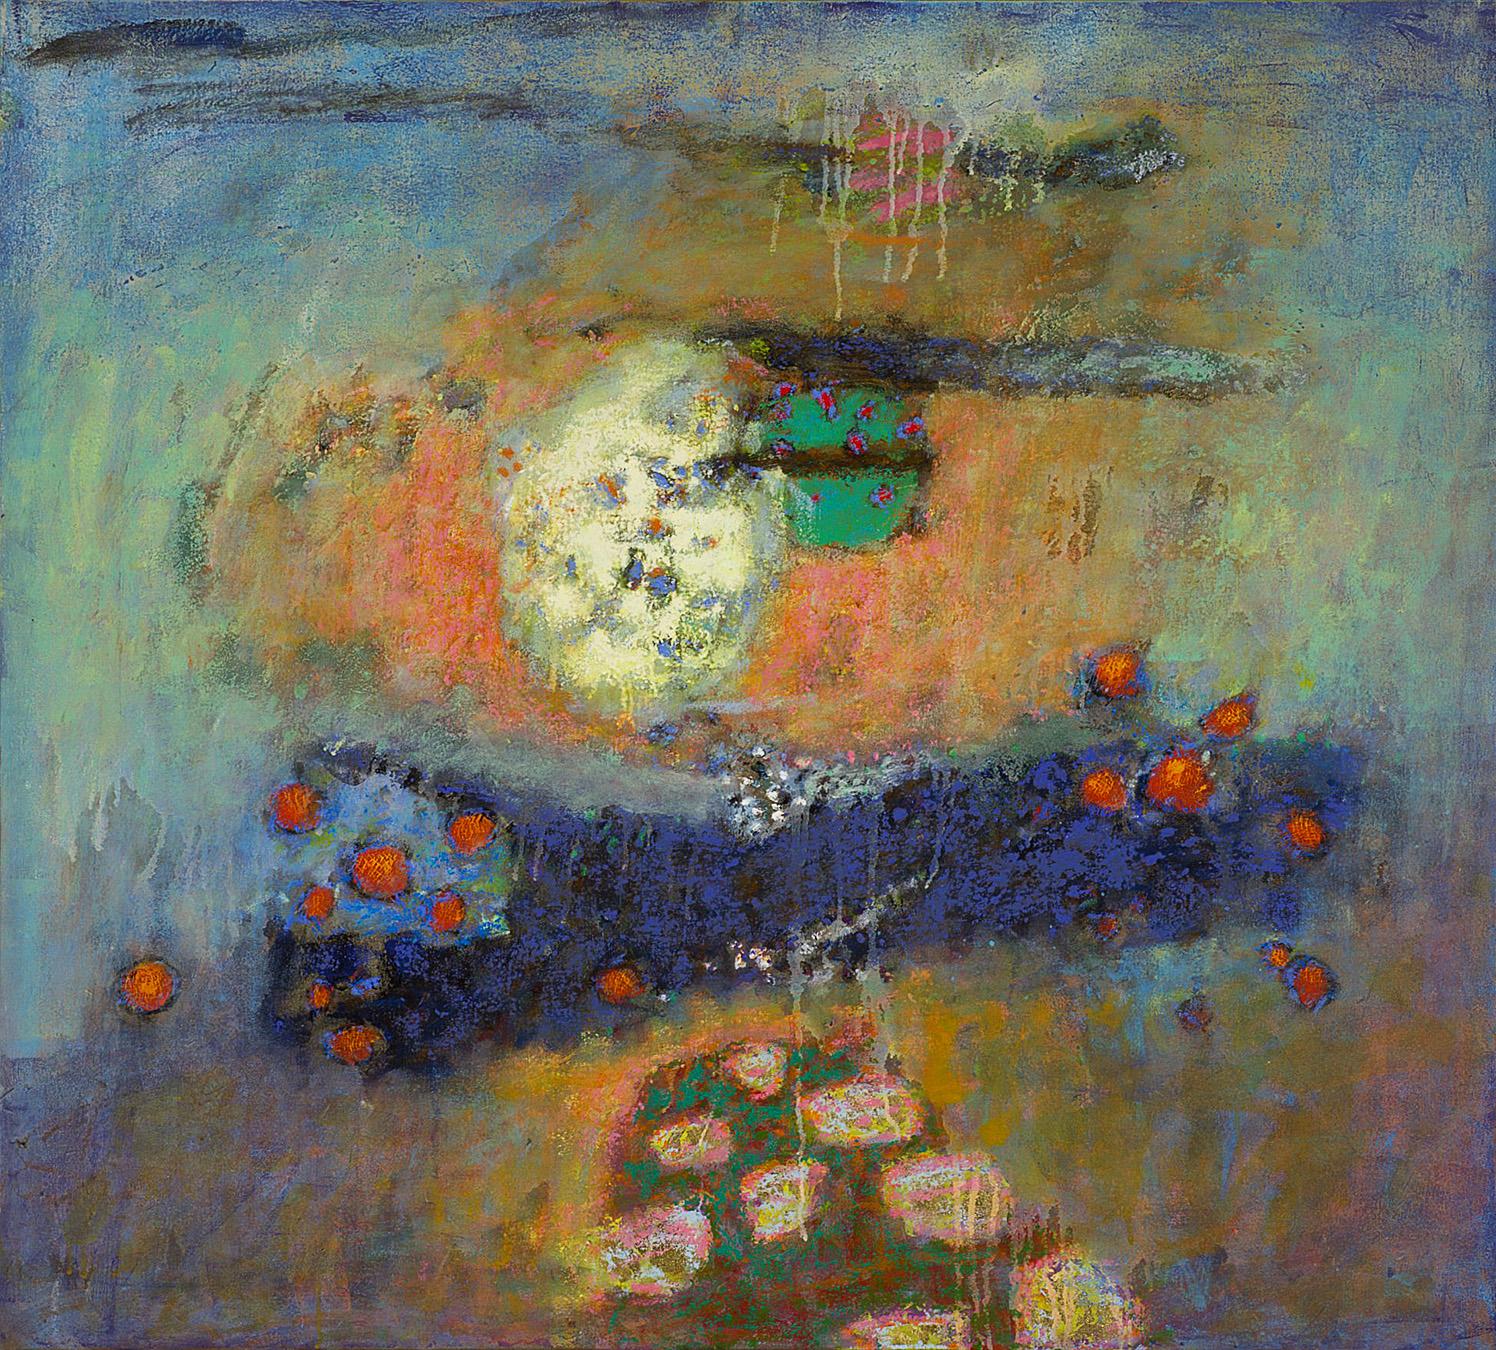 "Luminous Spaces  | oil on canvas | 36 x 40"" | 2014"